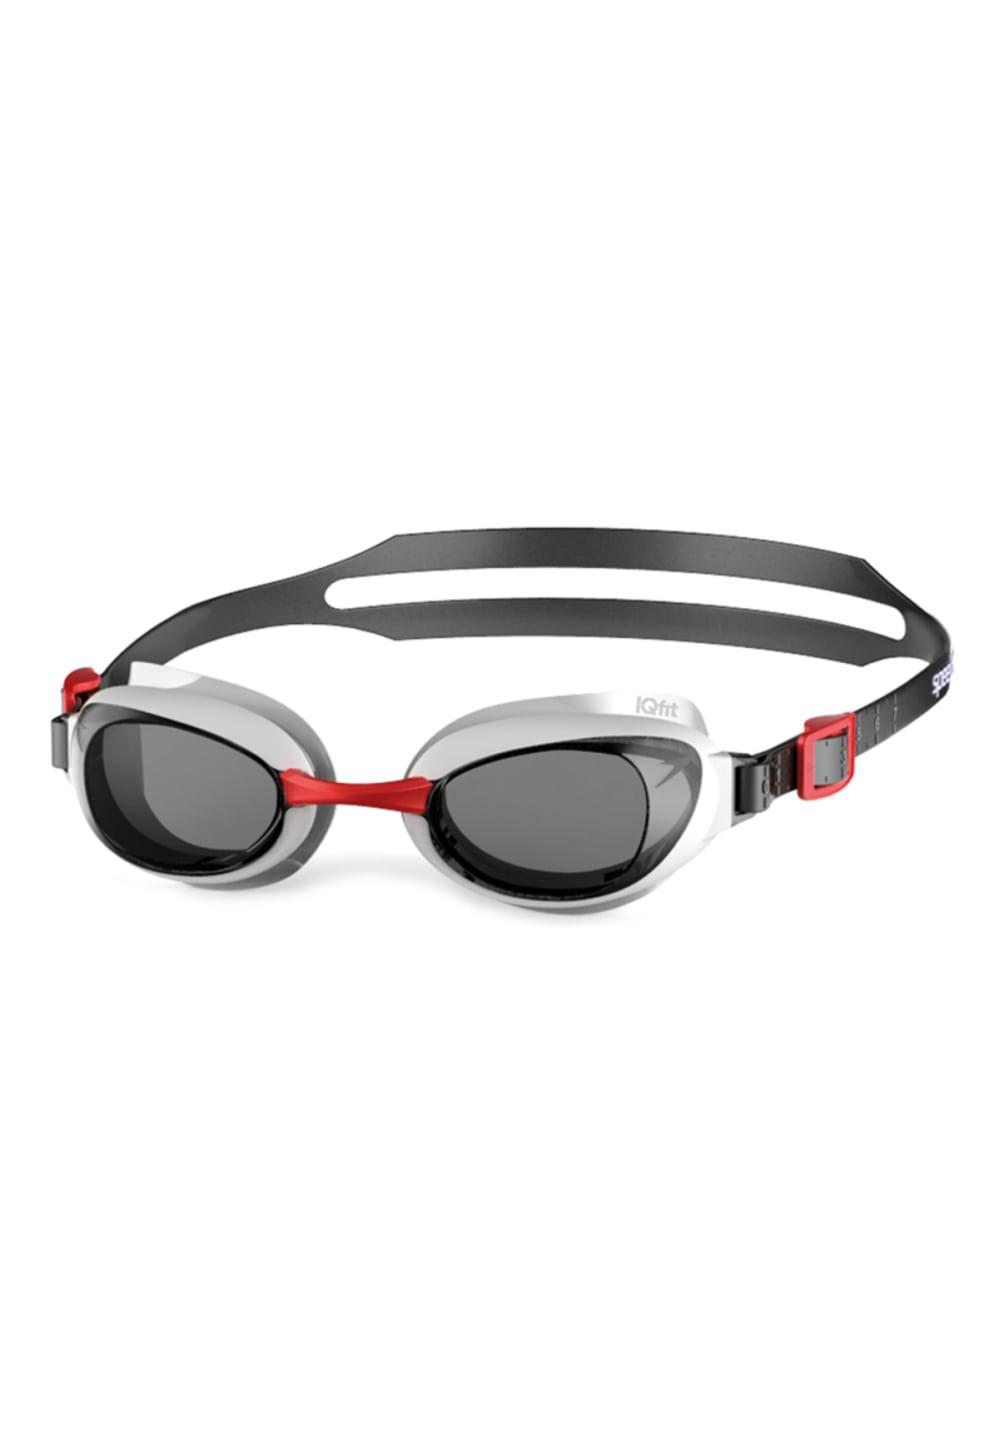 Speedo Aquapure Goggles Schwimmen - Grau, Gr. One Size